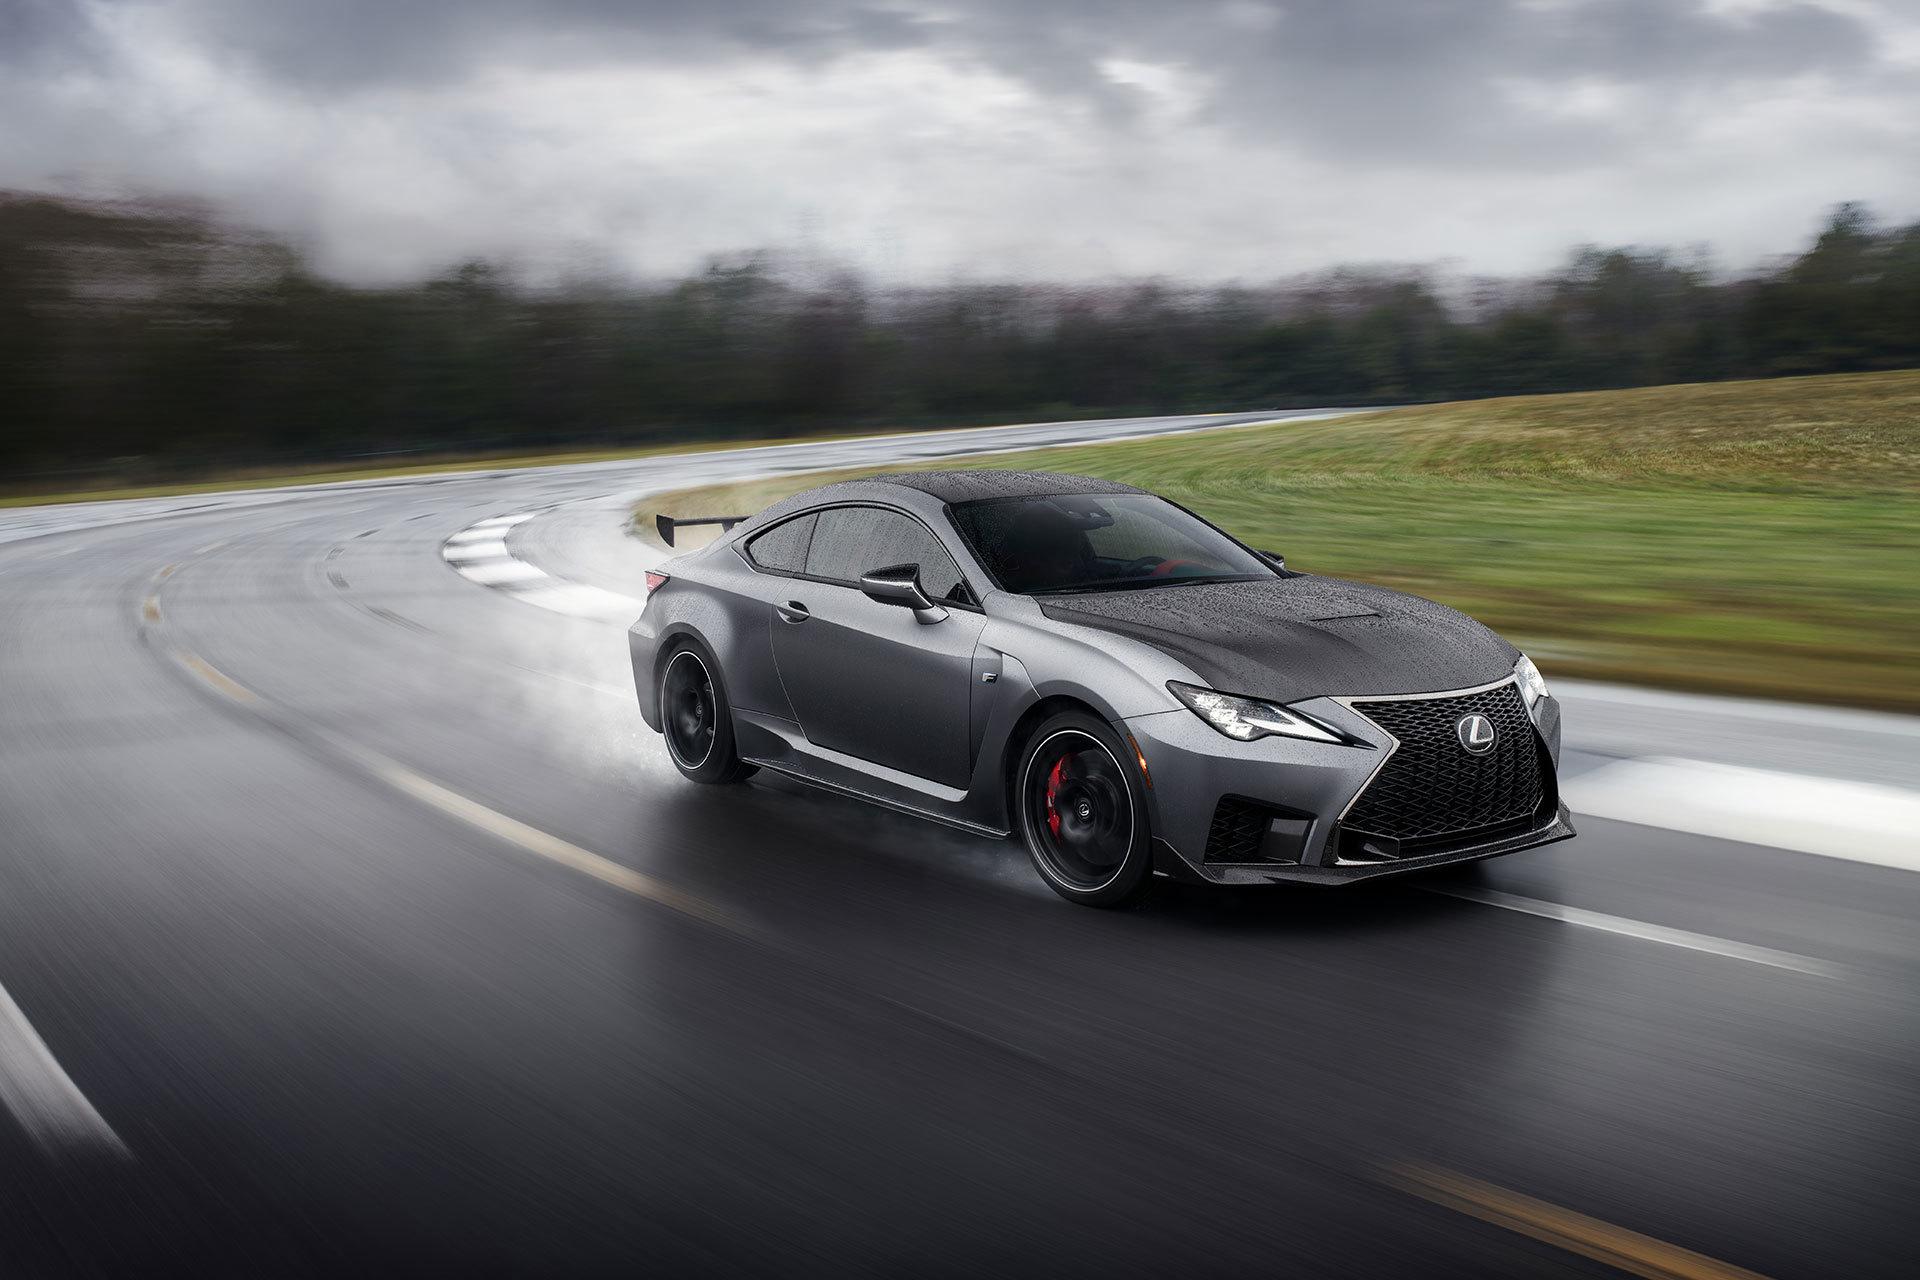 Lexus Rc F 2019 Track Edition Gris 01 Circuito